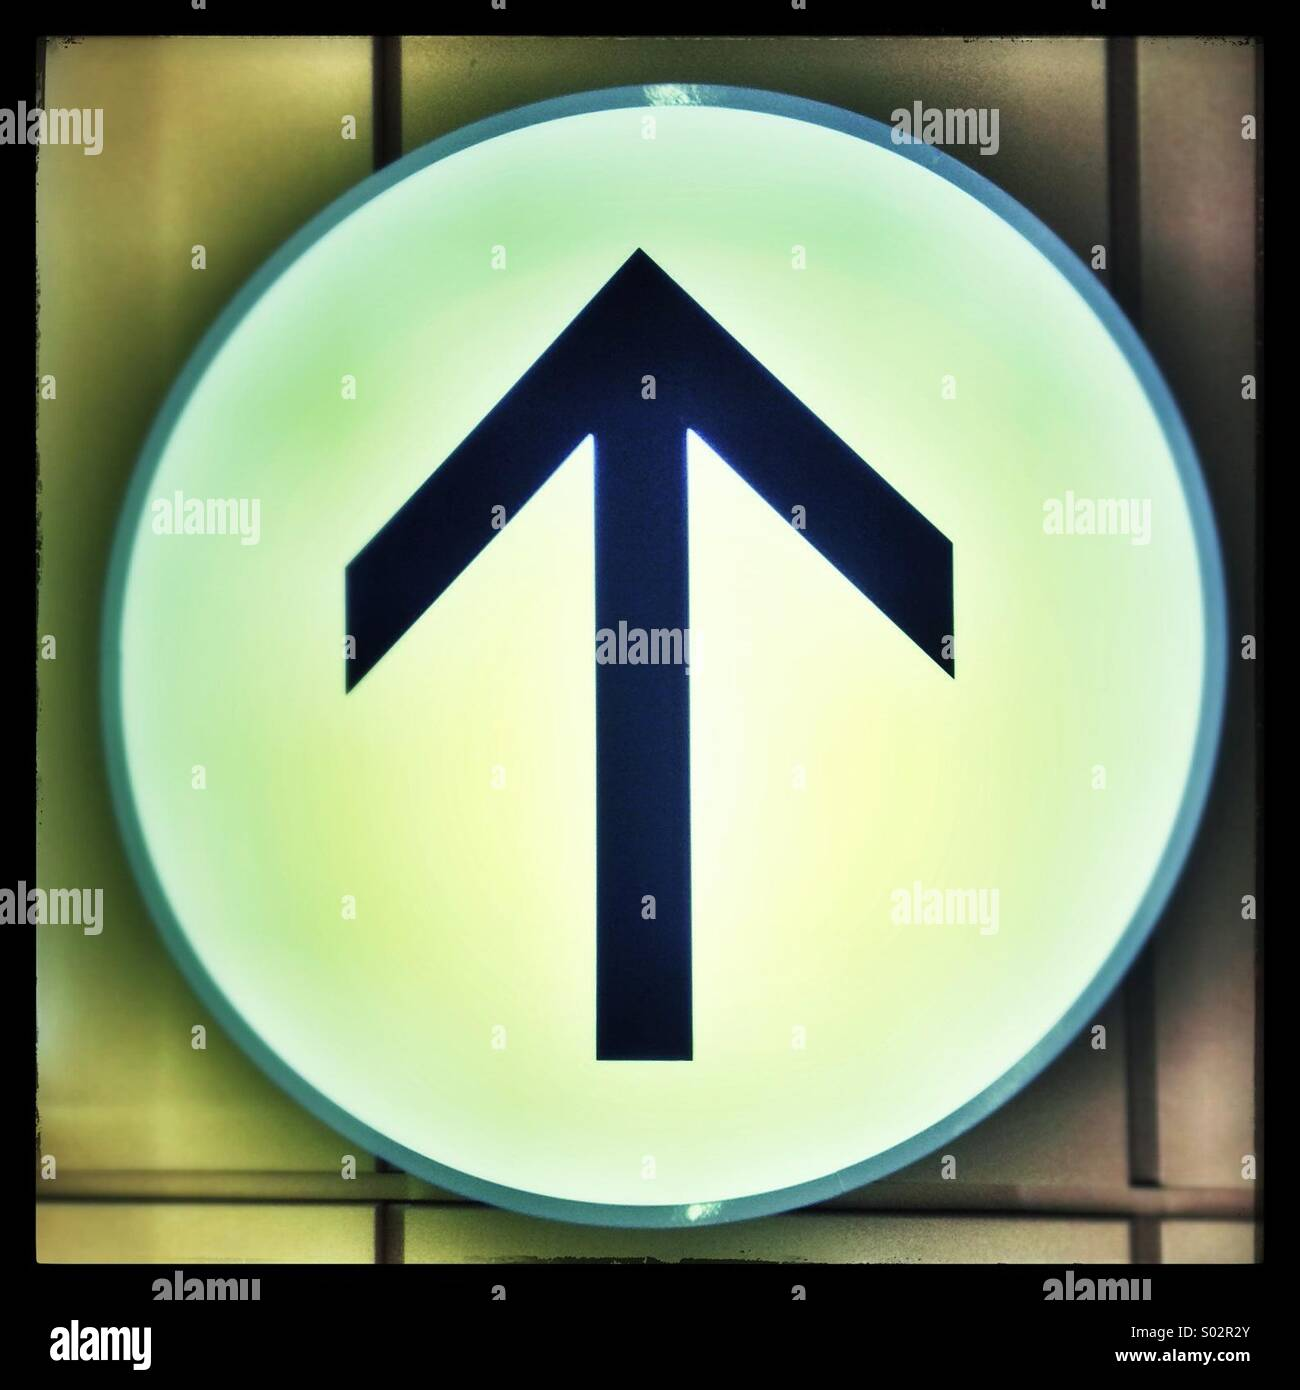 Arrow sign pointing upwards - Stock Image